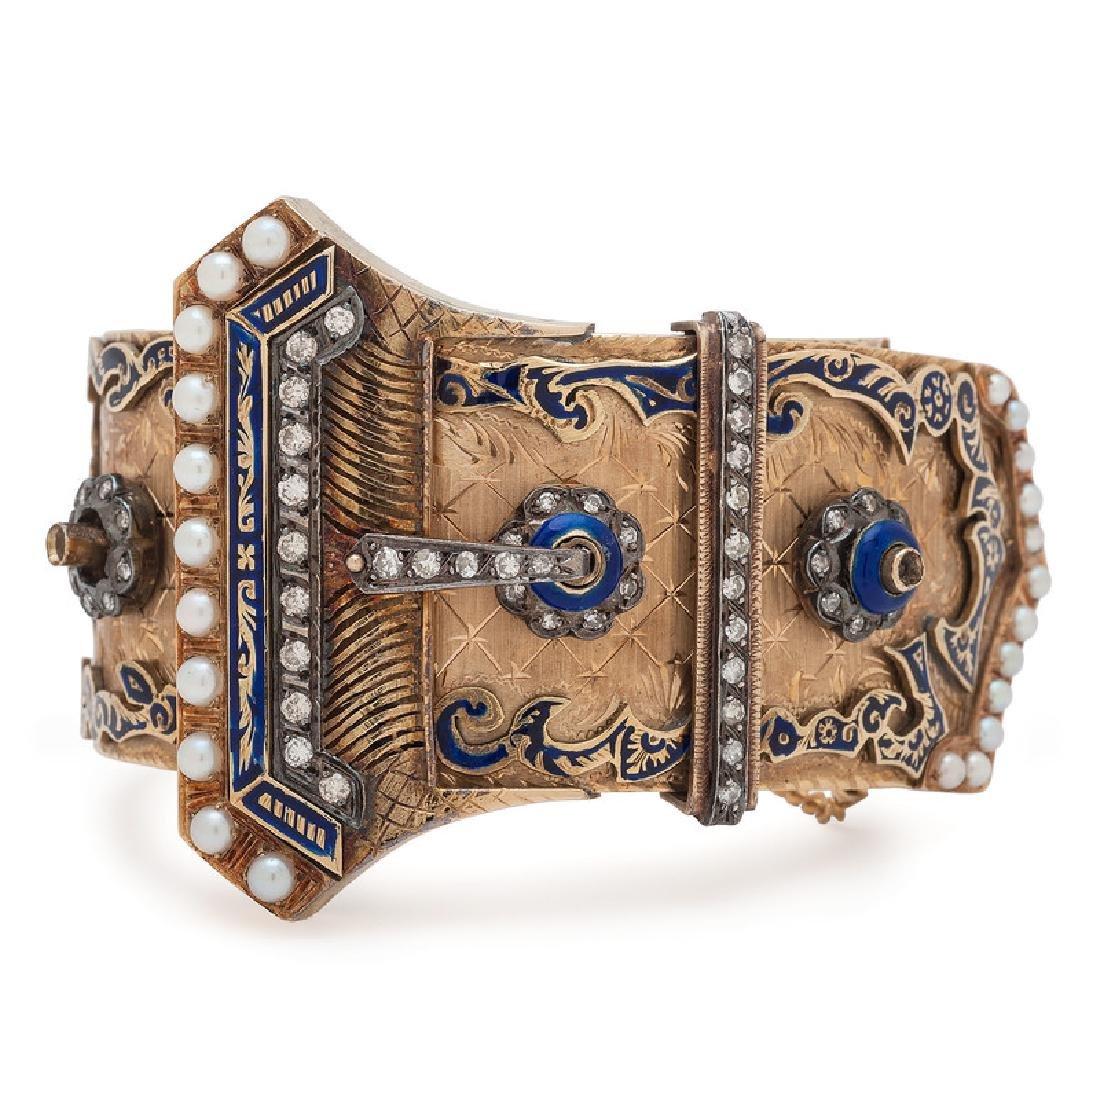 14 Karat Yellow Gold Buckle Bracelet